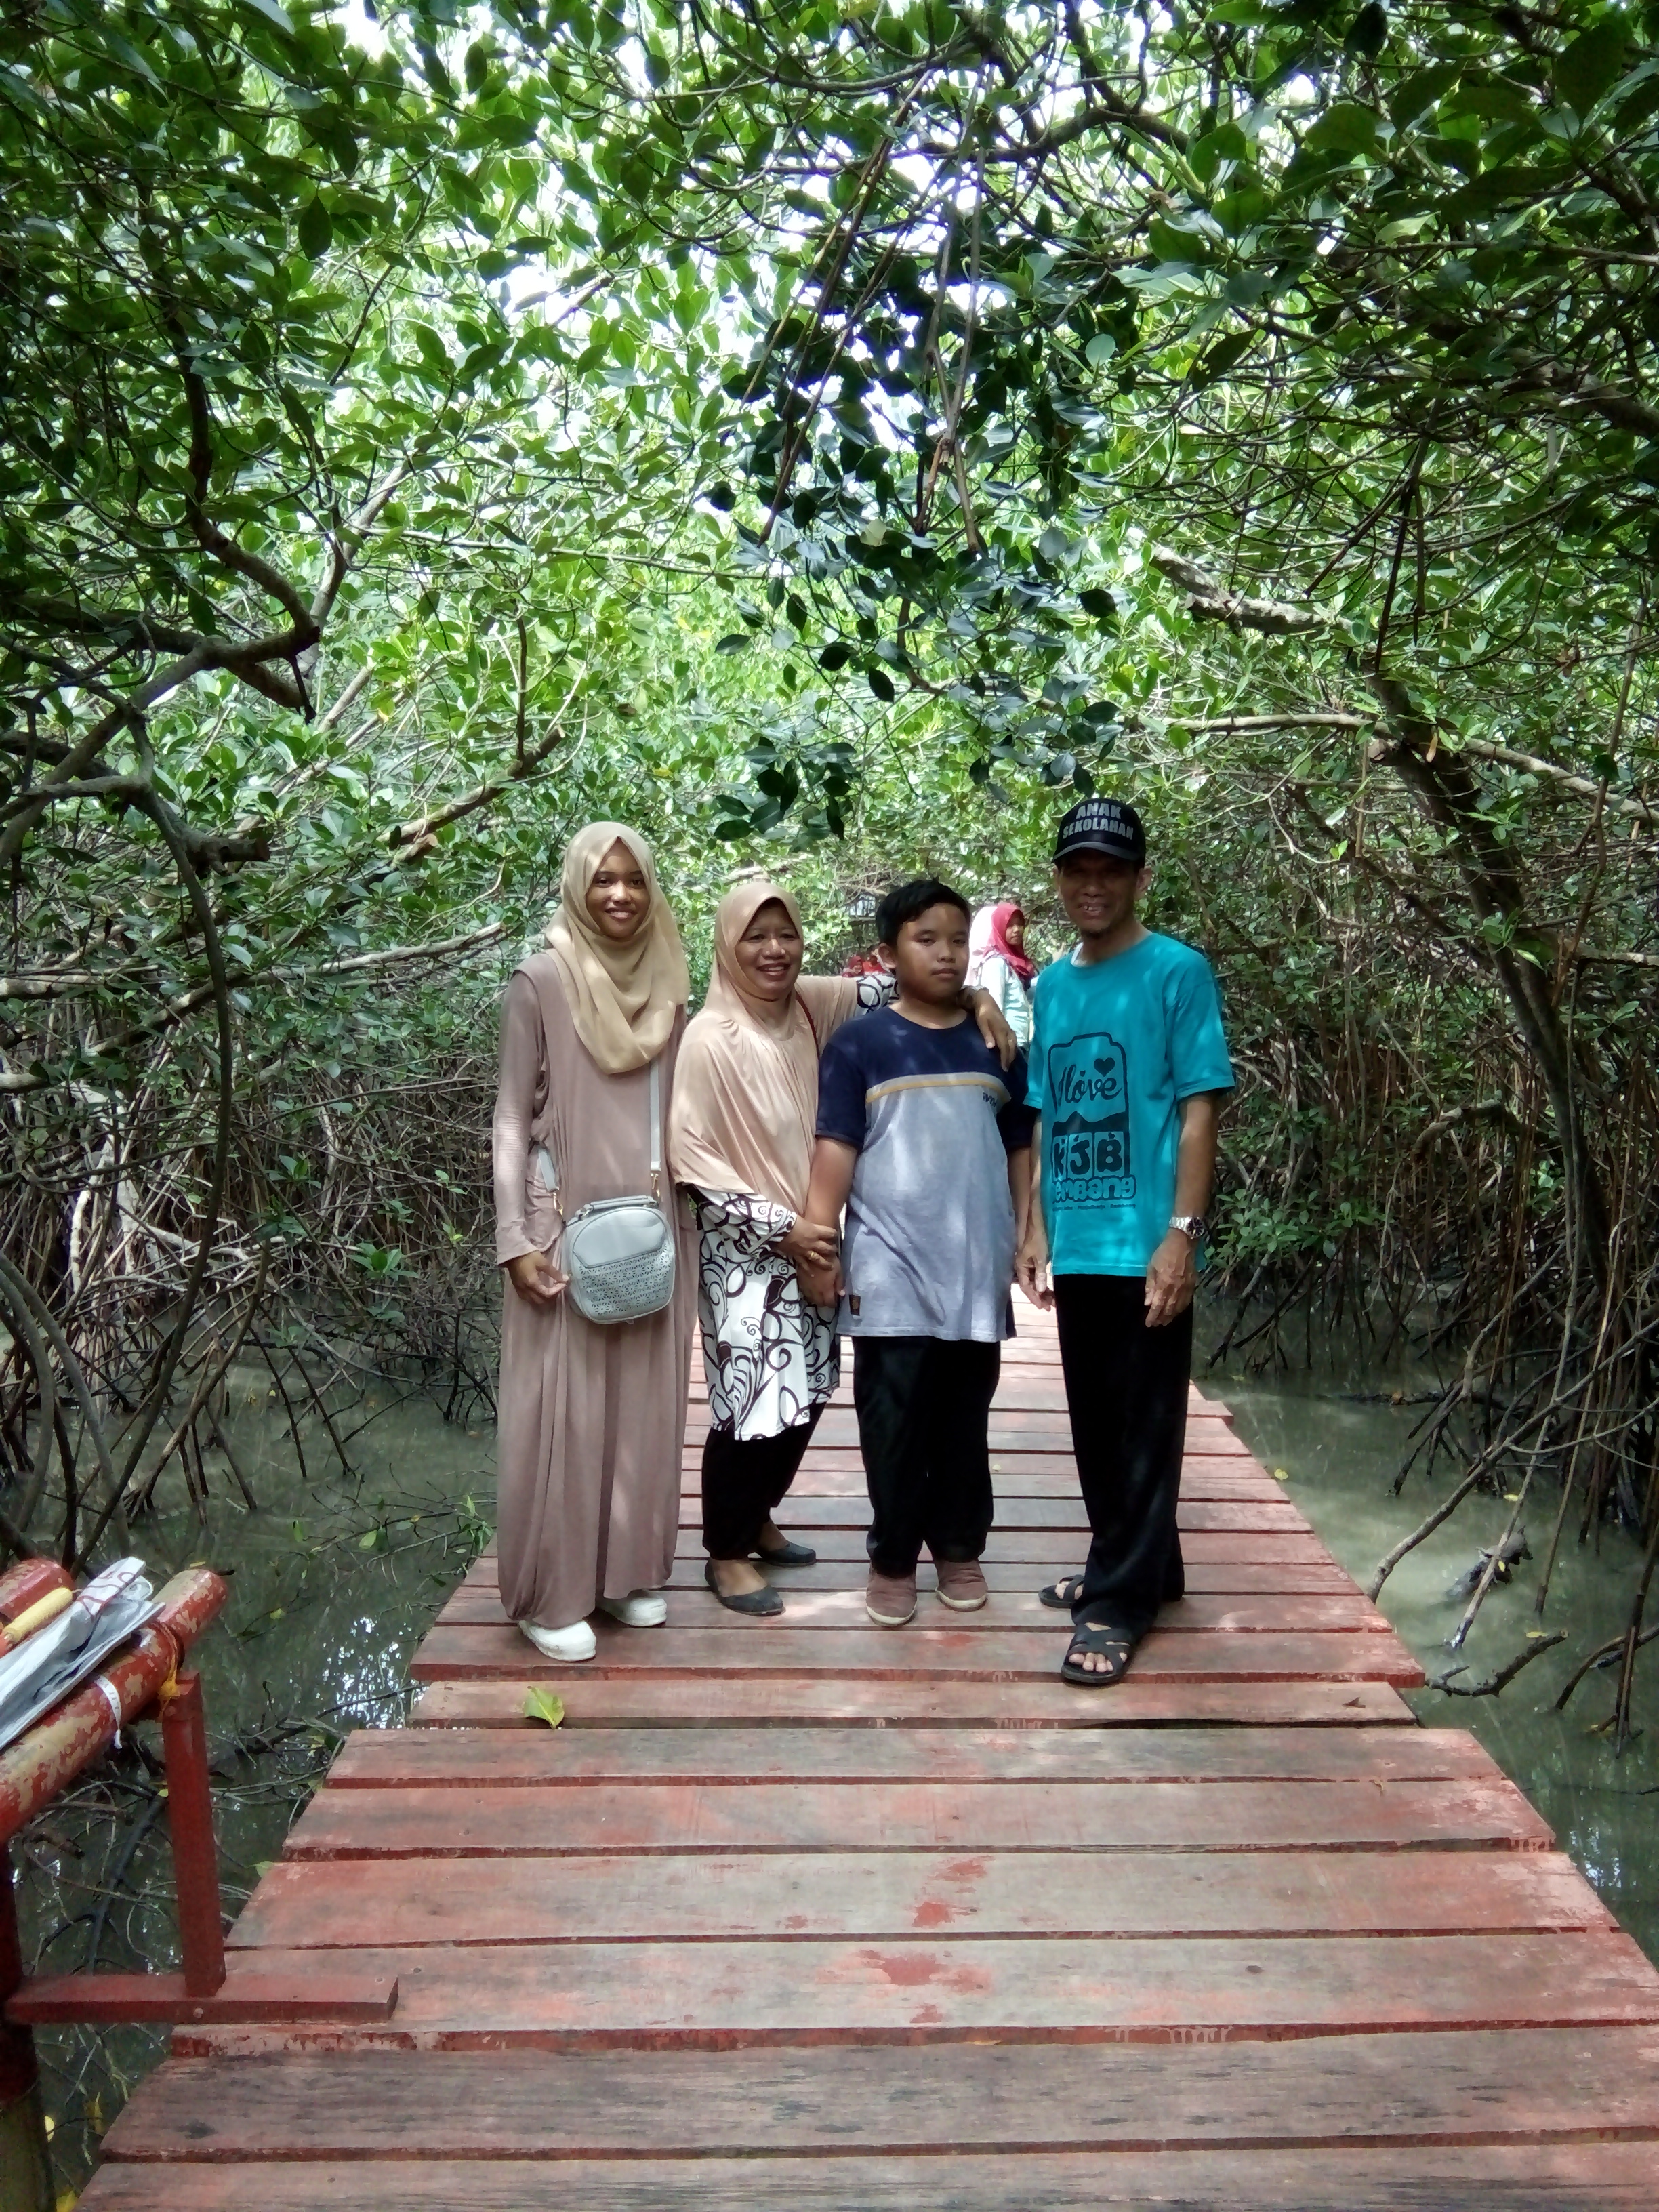 July 2017 Osis Smansa Rembang Wisata Alam Hutan Mangrove Pasarbanggi